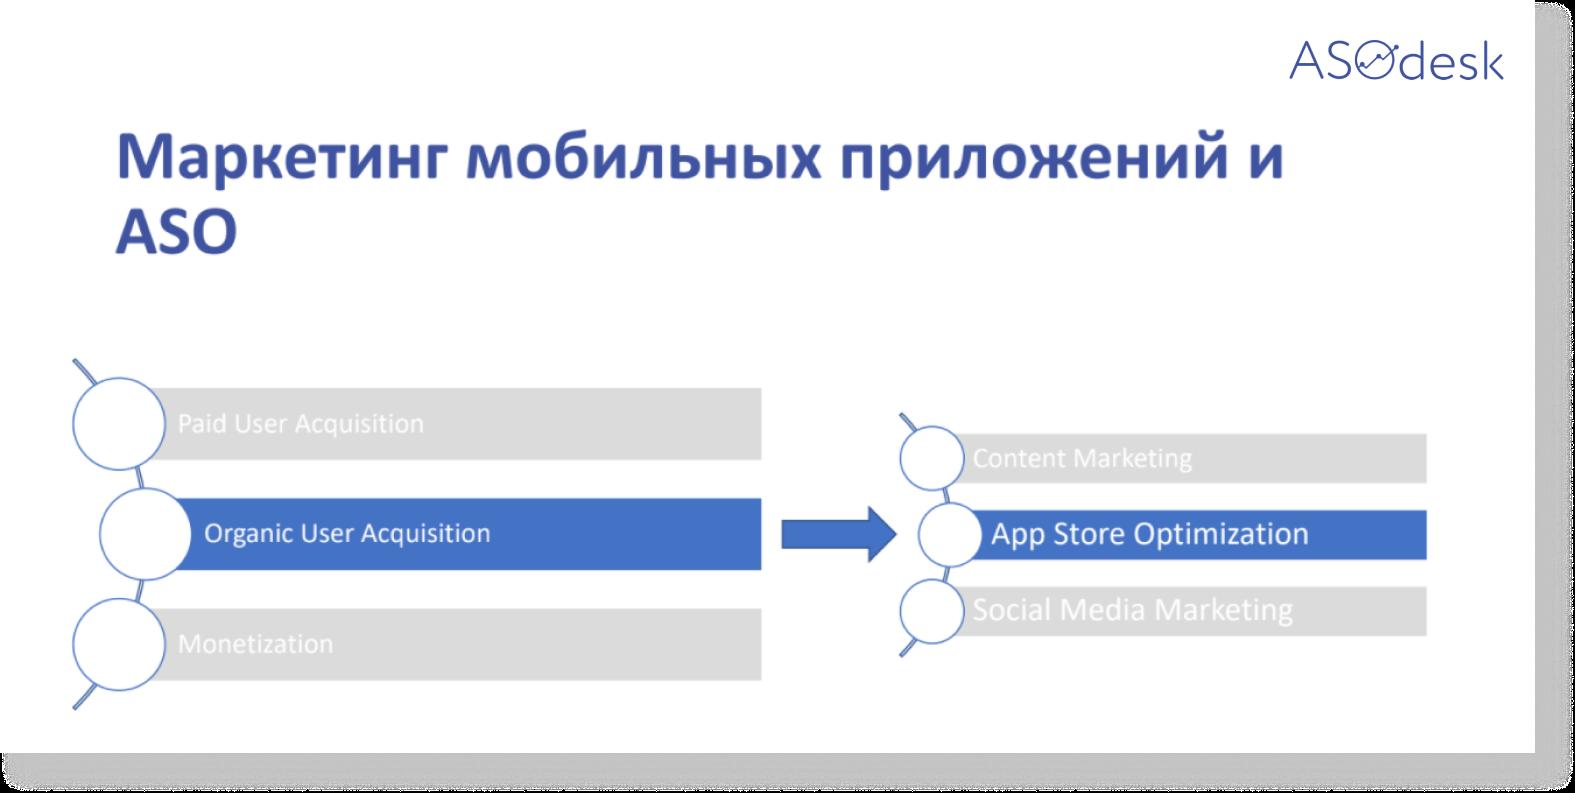 Маркетинг мобильных приложений делится на Organic User Acquisition, Paid User Acquisition и Monetisation